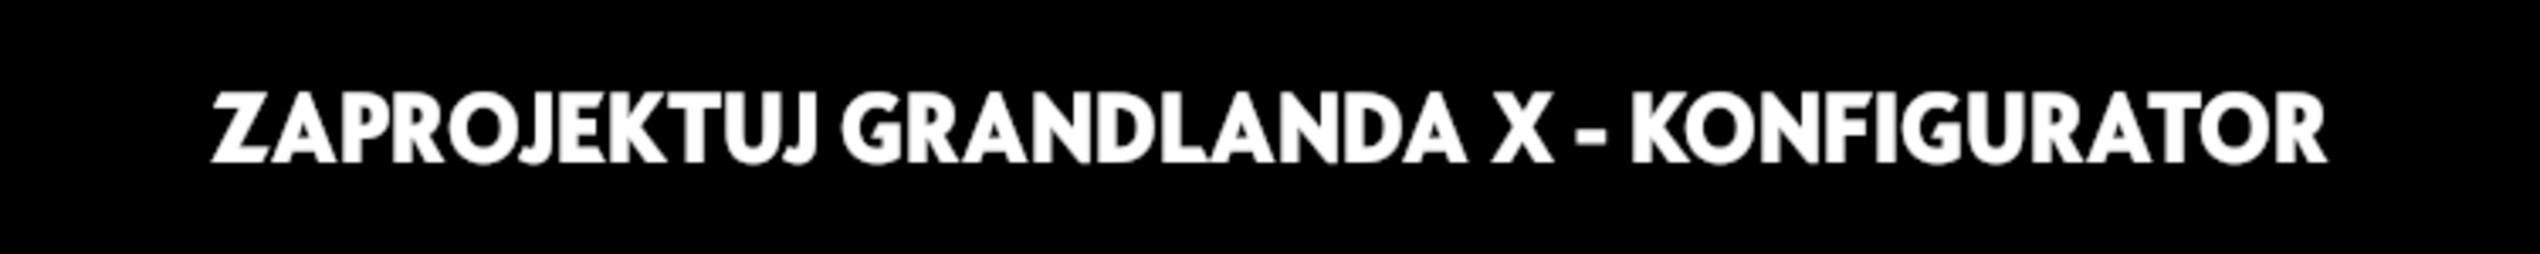 Konfigurator Opel Grandland X